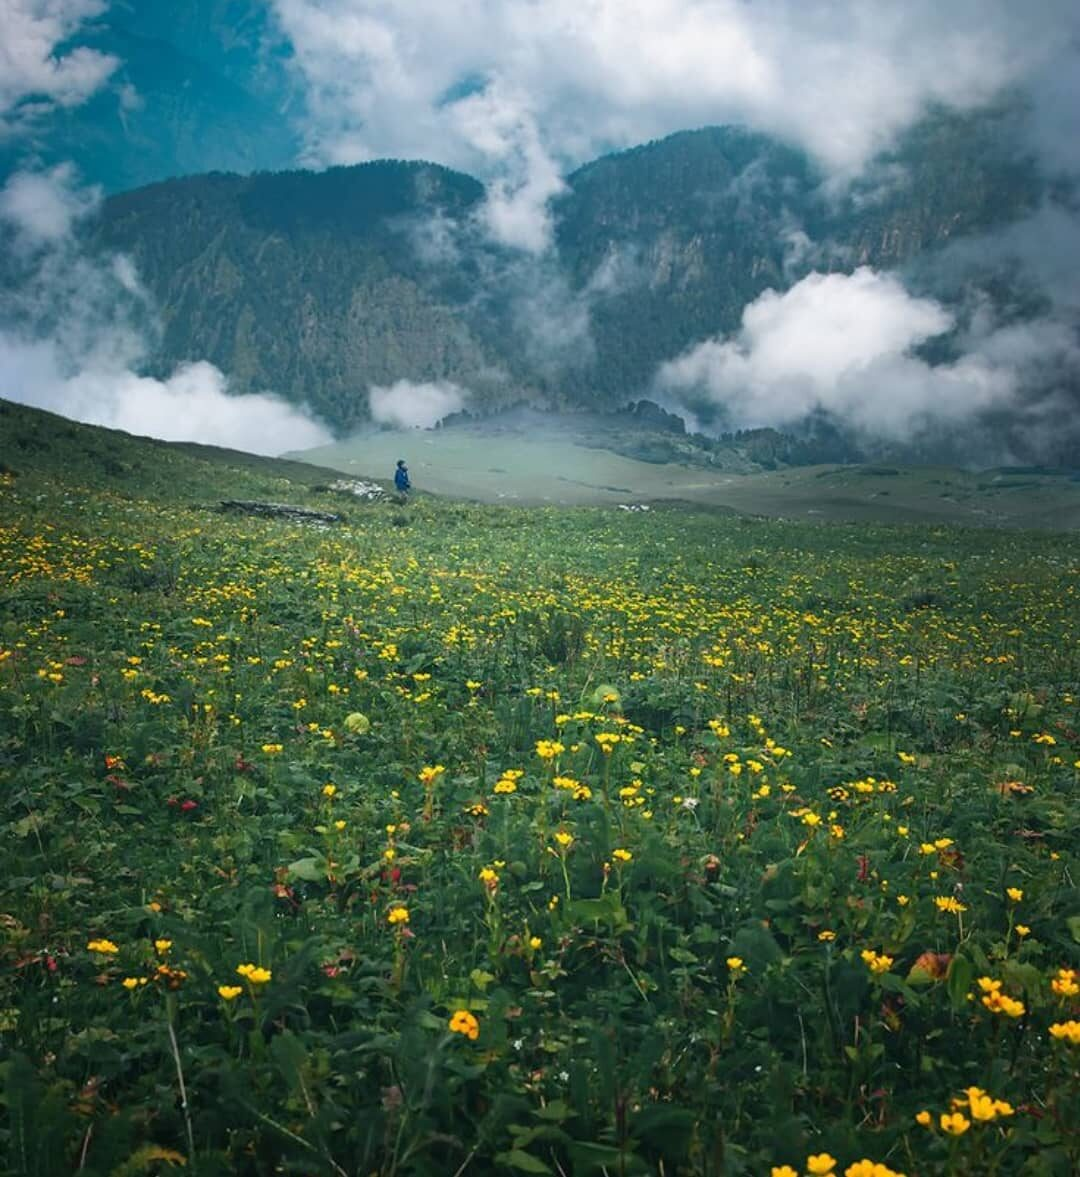 crop 0 0 1080 1177 0 10 Famous Ayurvedic Herbs of Uttarakhand